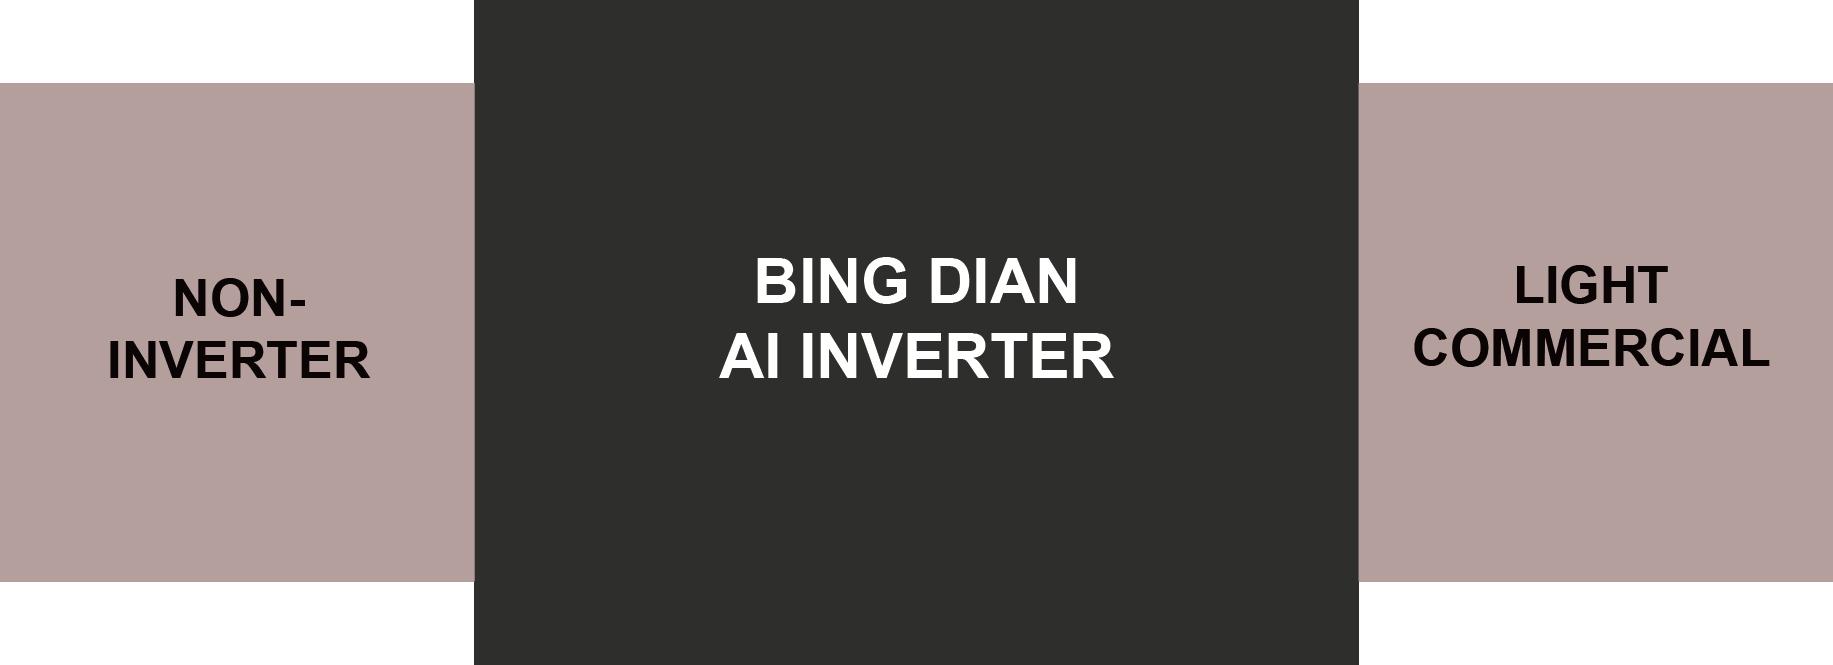 bingdian air conditioners